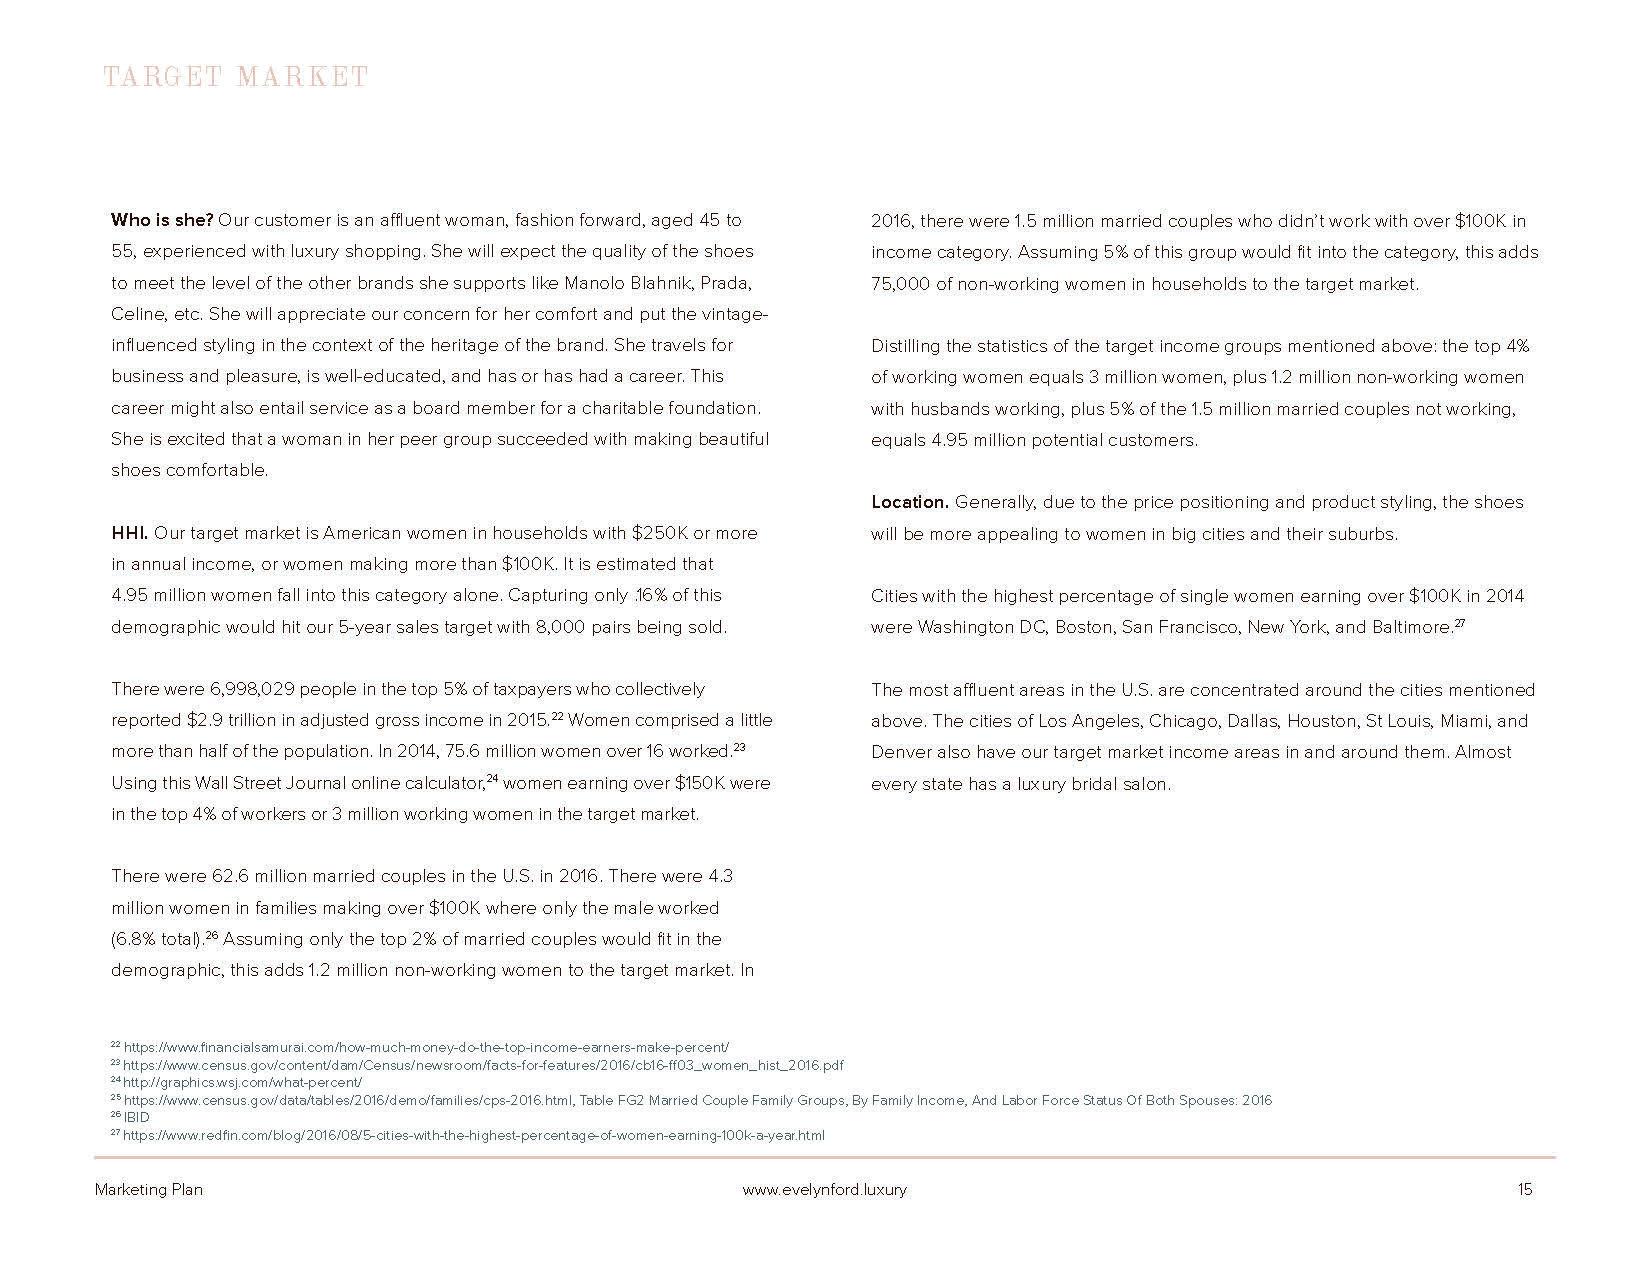 EFL_Marketing_Plan_110118_Page_15.jpg